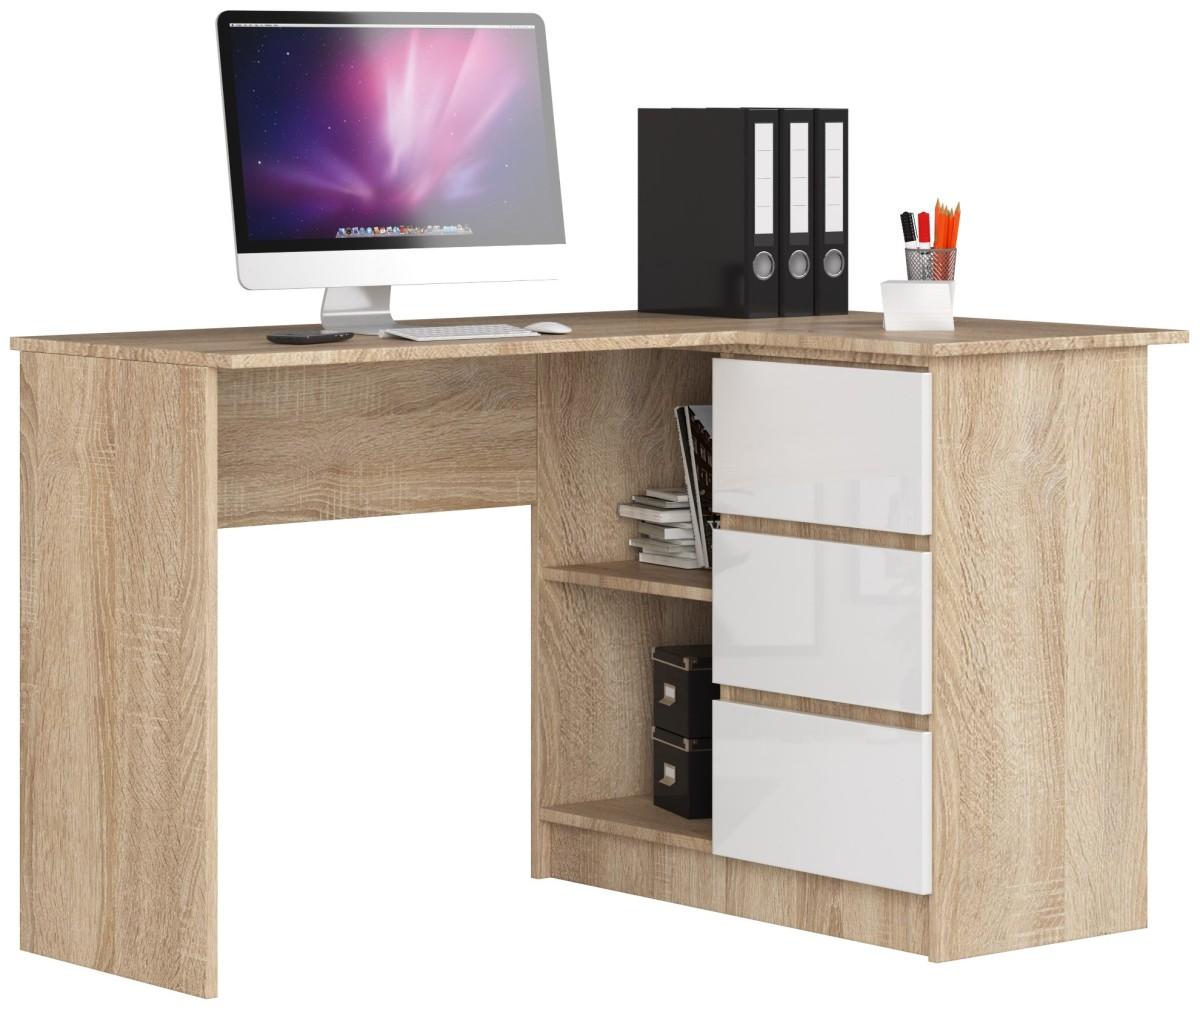 Rohový psací stůl B16 124 cm dub sonoma/bílý lesk pravý